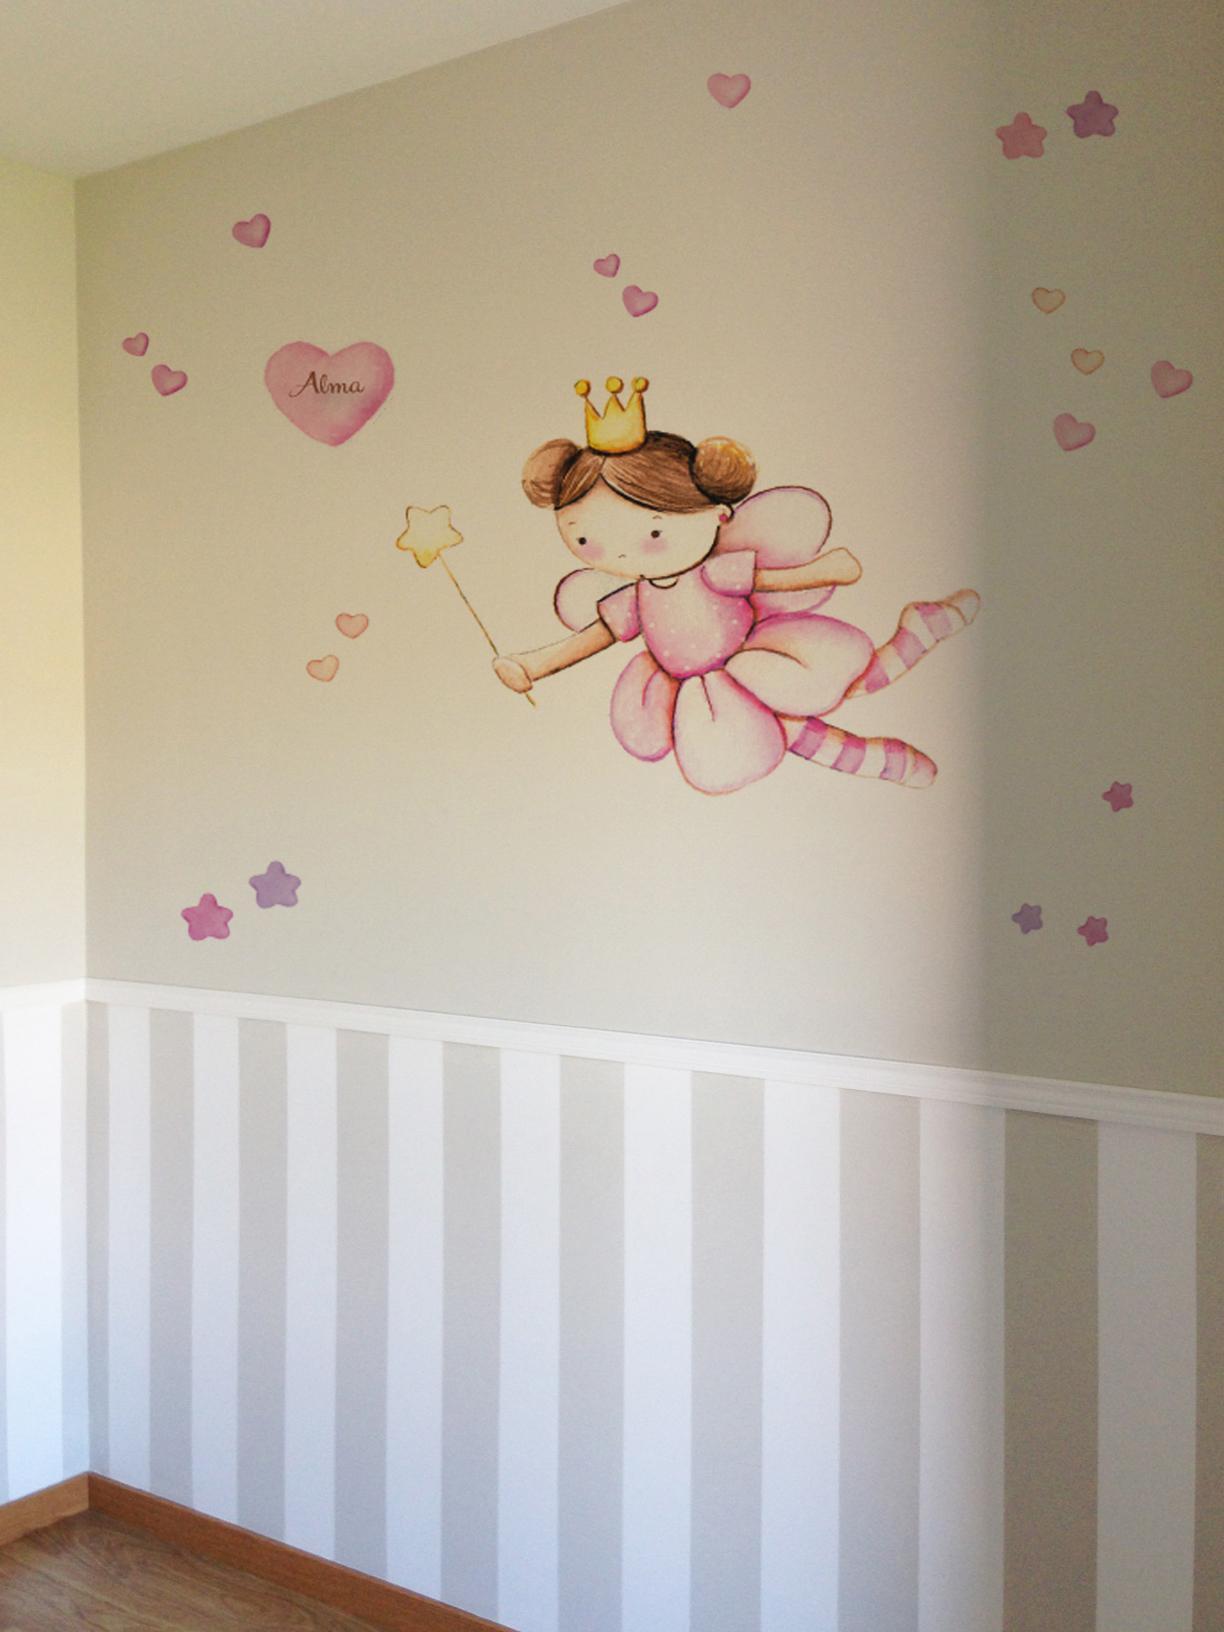 VINILO INFANTIL: hada con corazones